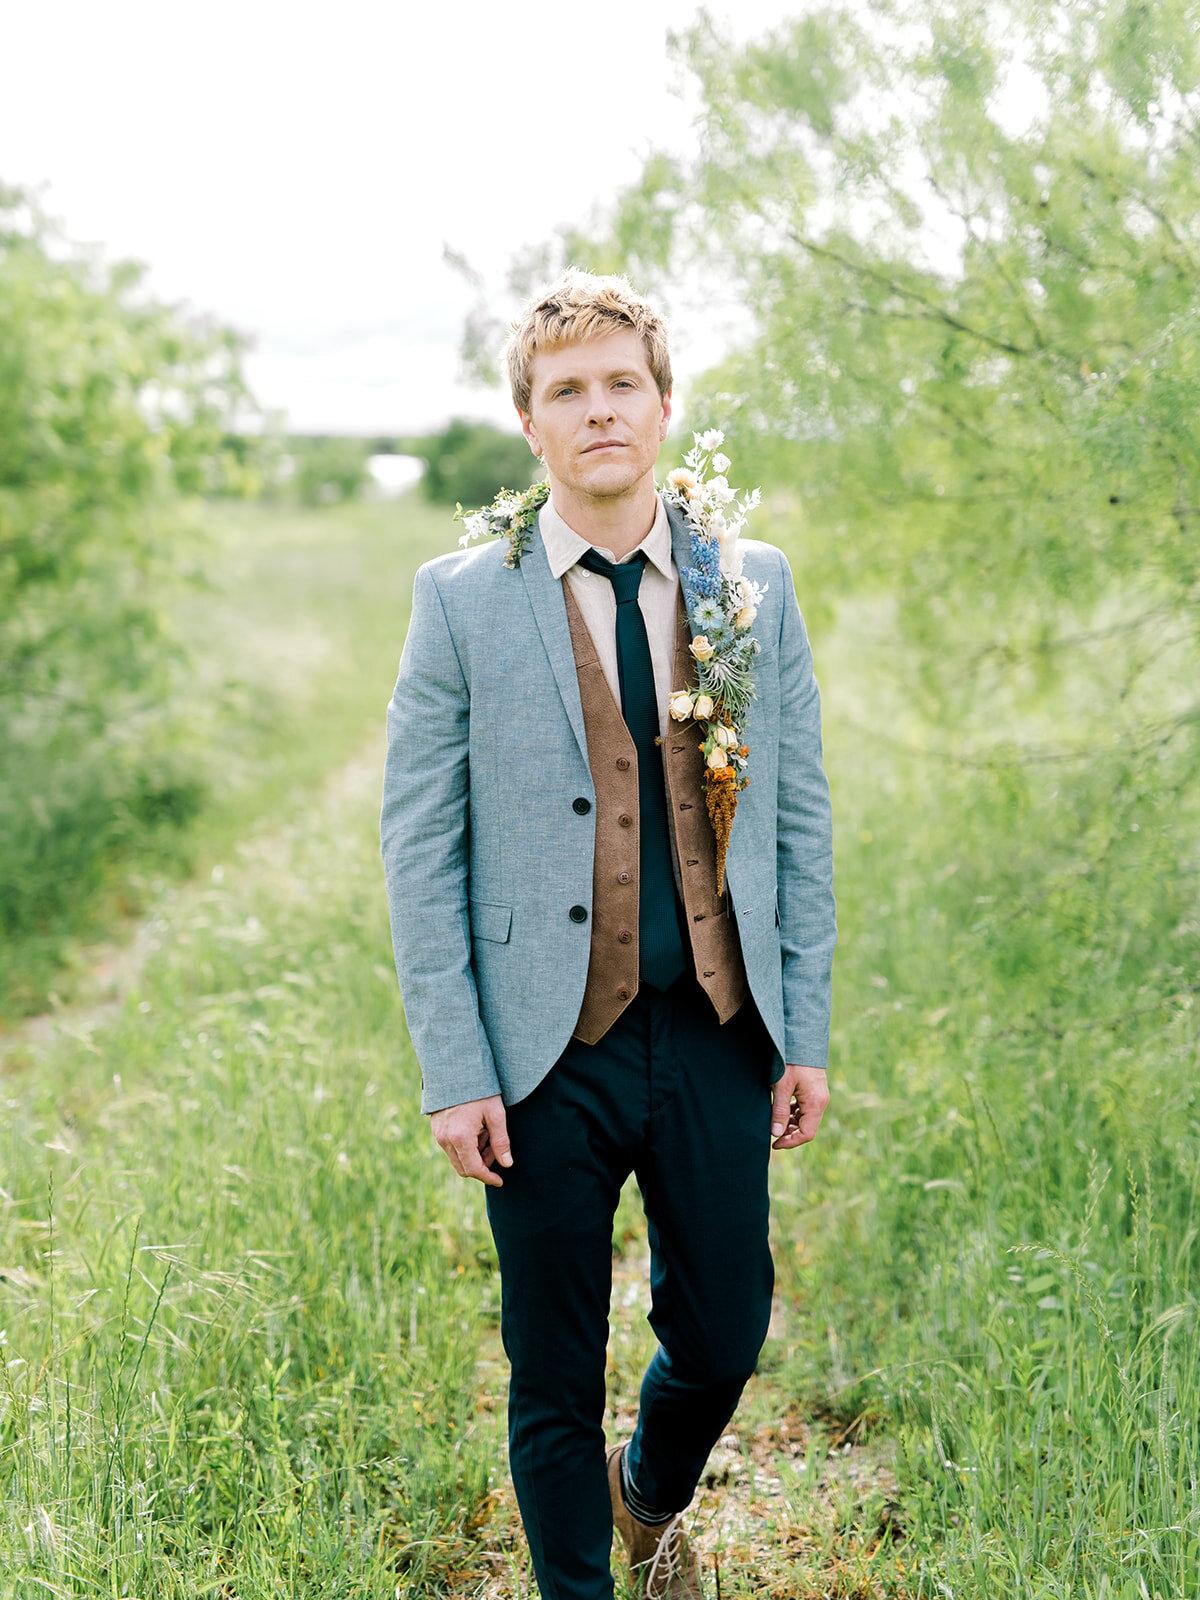 Elegant Countryside Wedding Floral Lapel